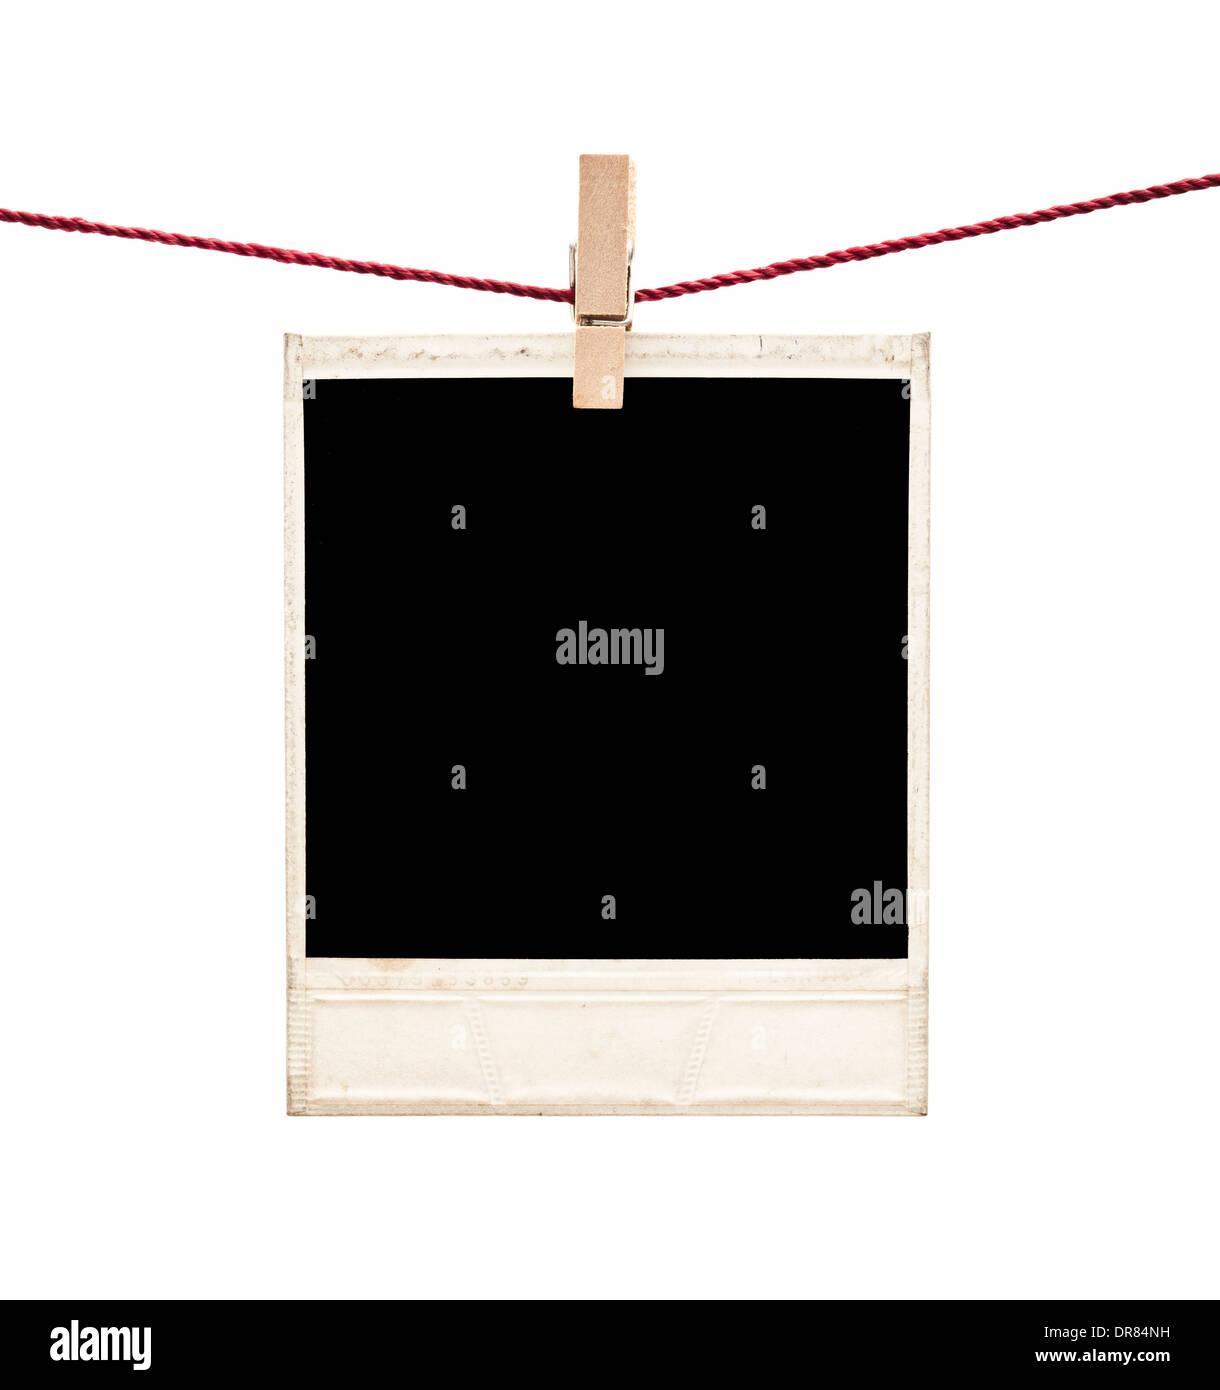 Polaroid Bilderrahmen auf weiß Stockfoto, Bild: 65947549 - Alamy